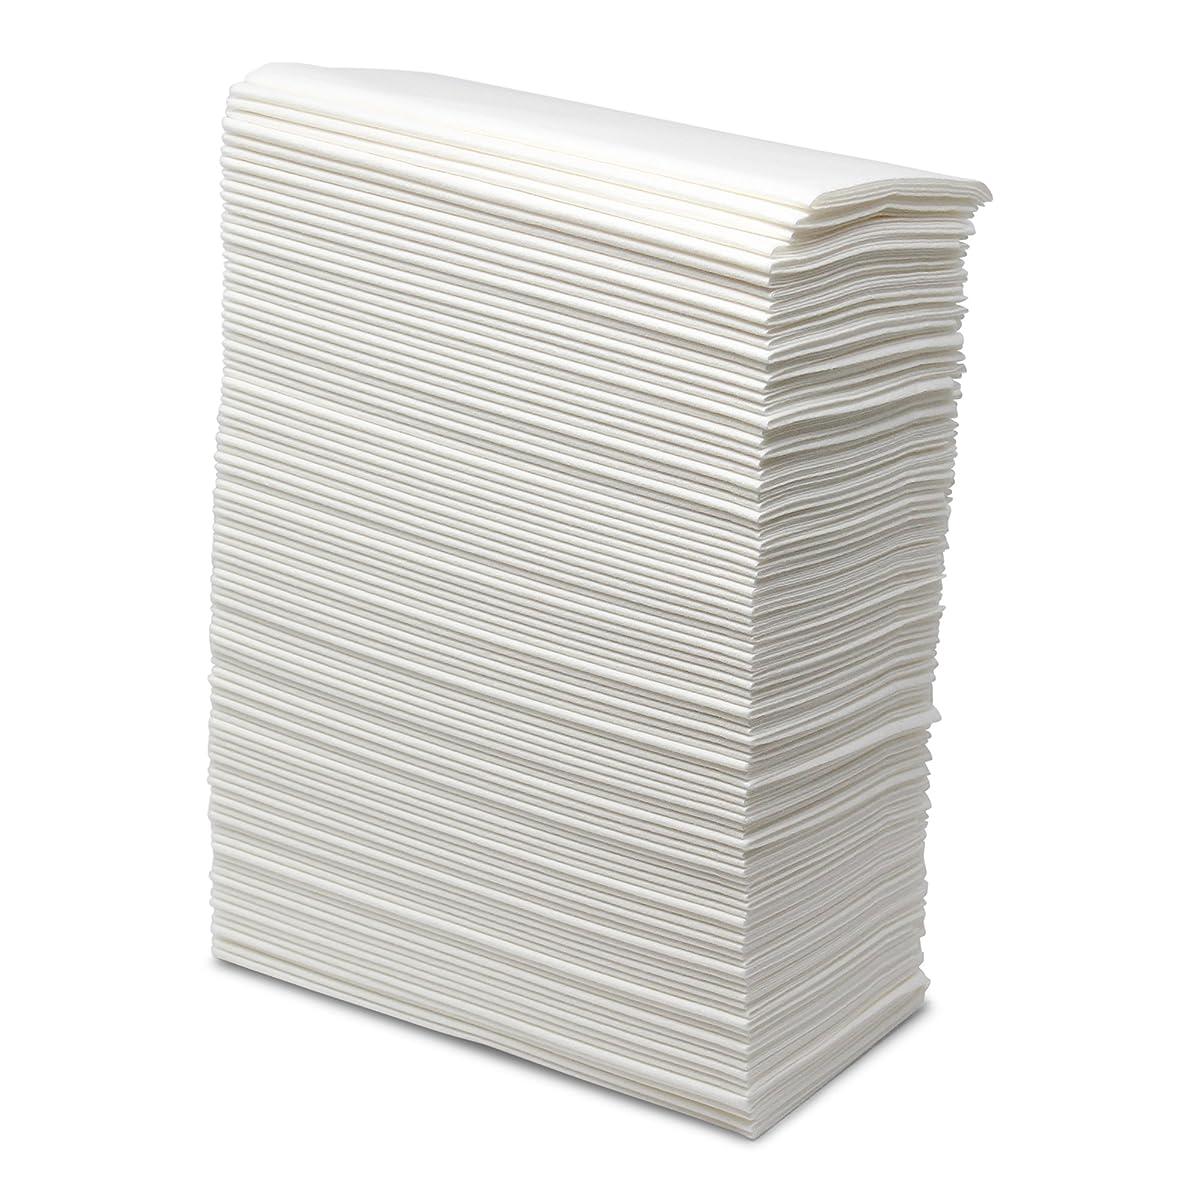 Linen Feel Napkins - 1000 Count - 8